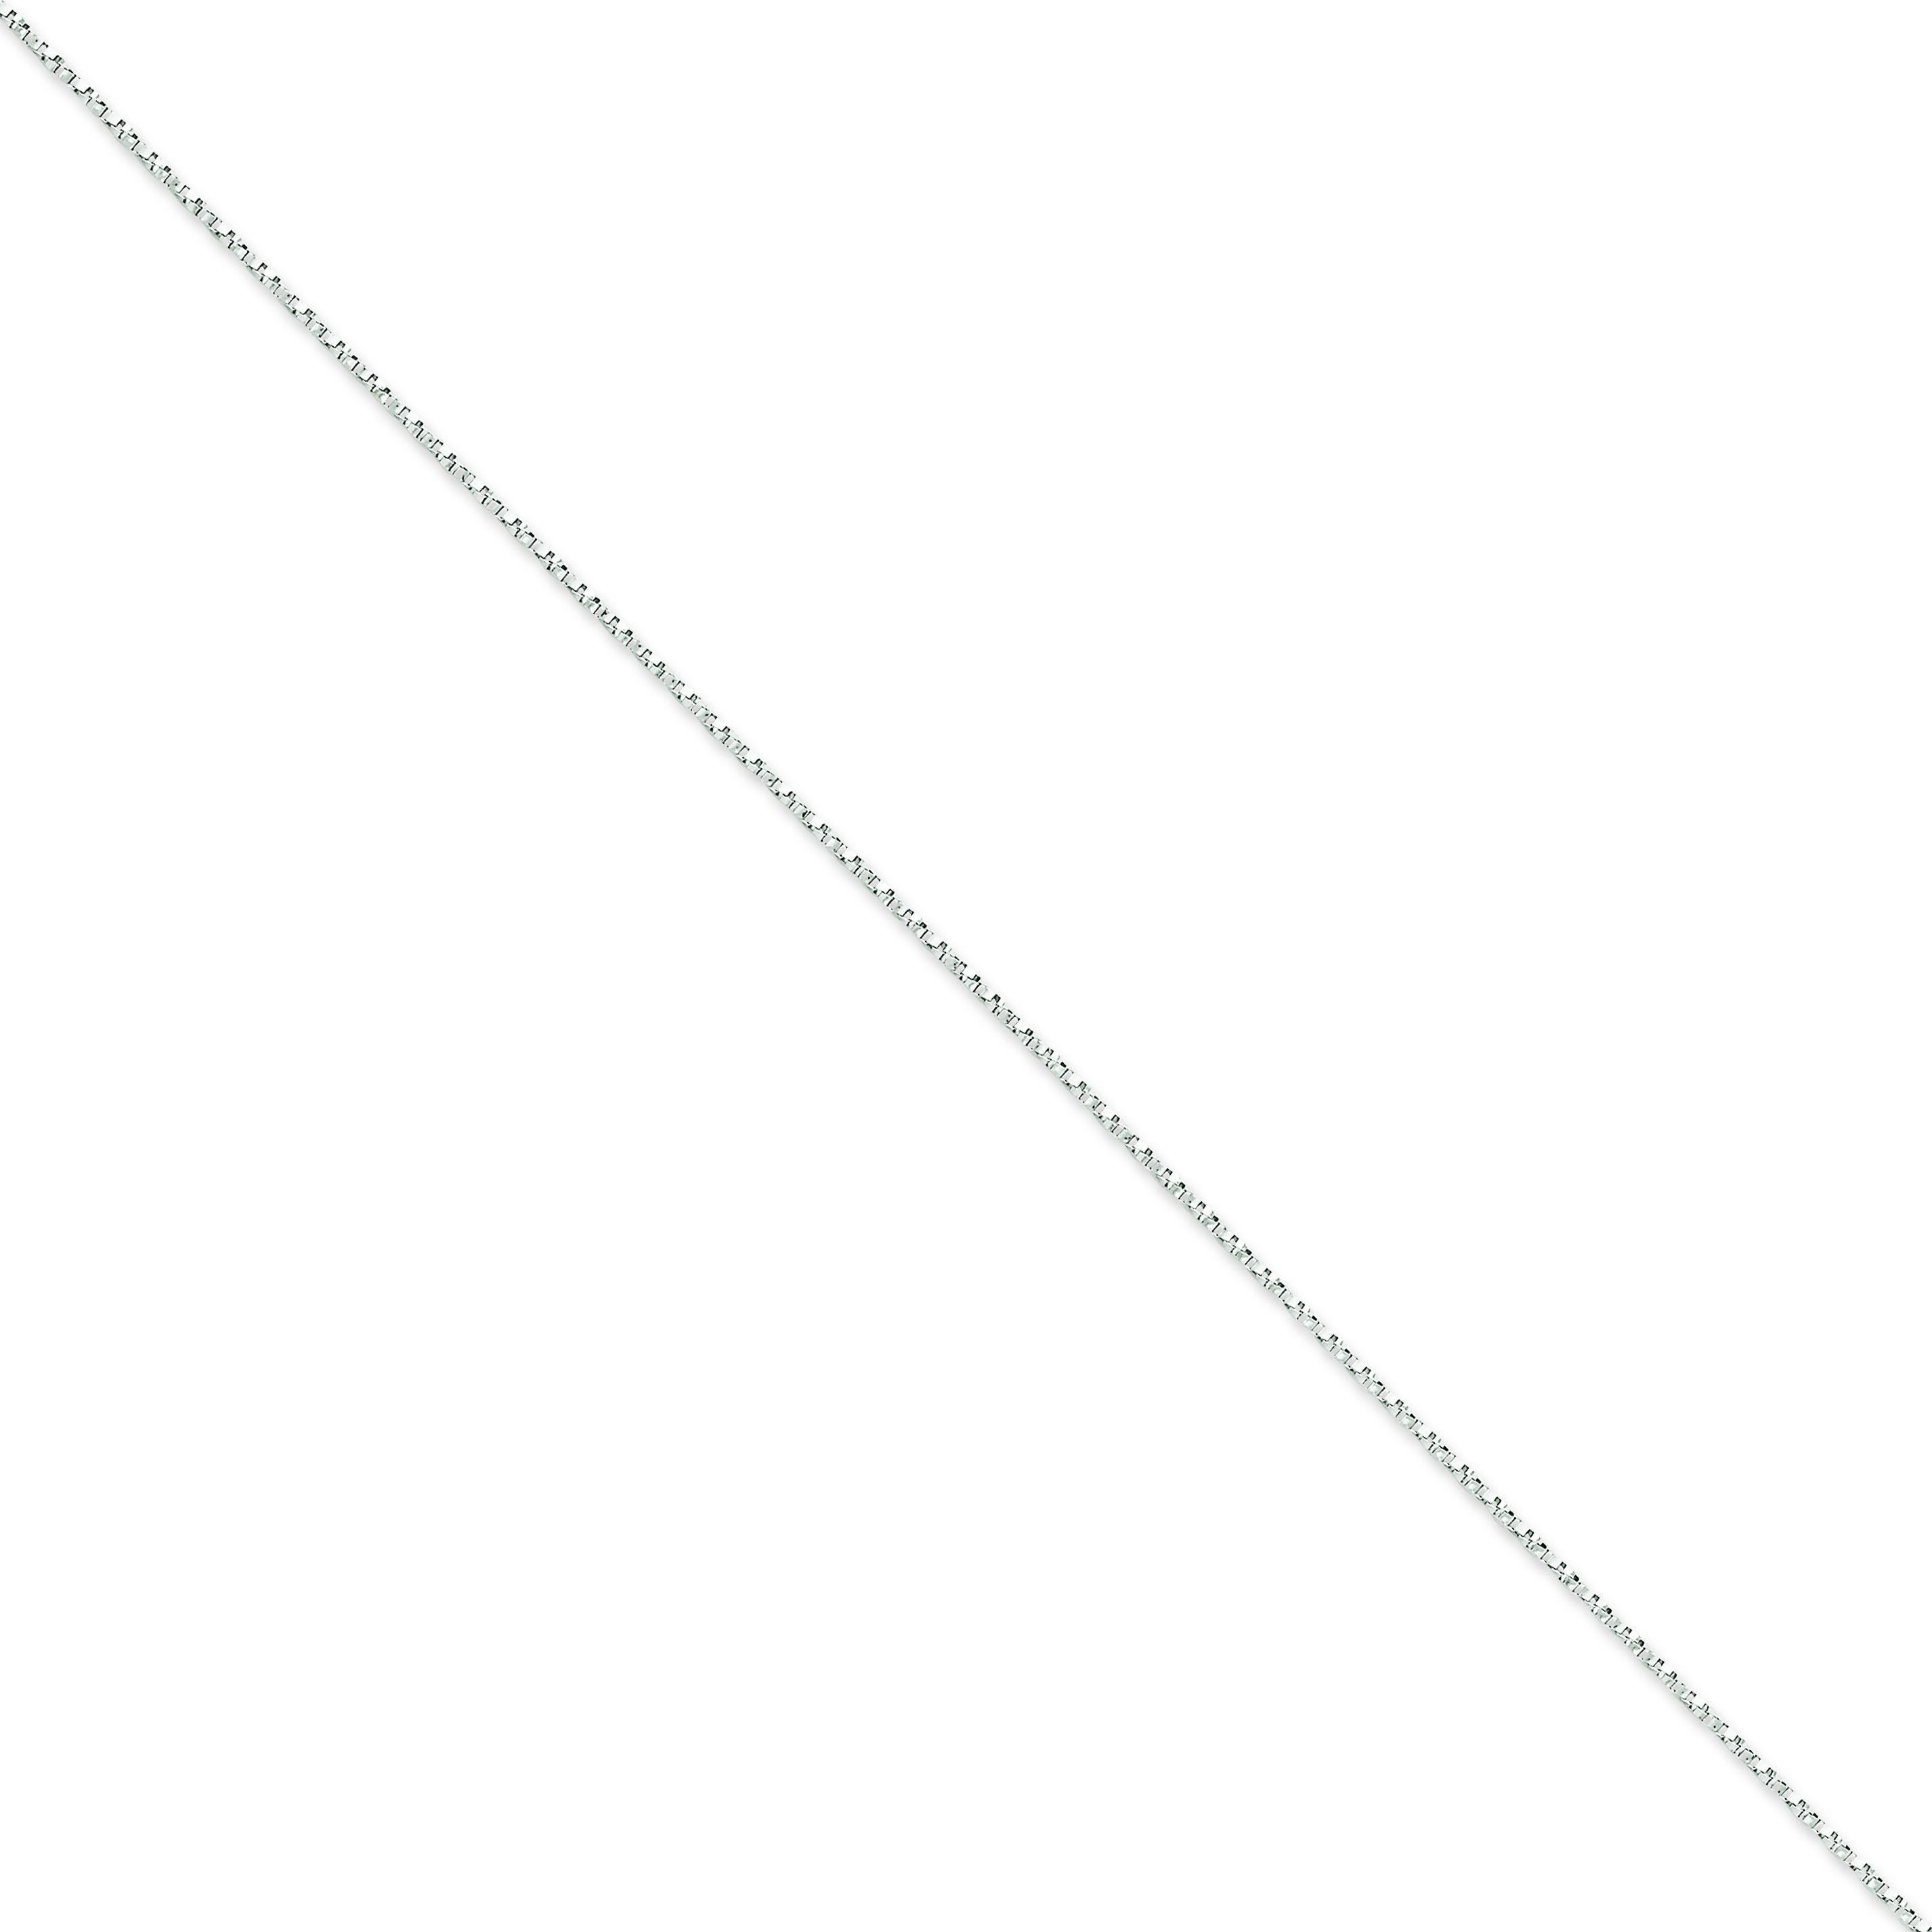 14k Yellow Gold 16 inch 1.20 mm  Box Choker Necklace